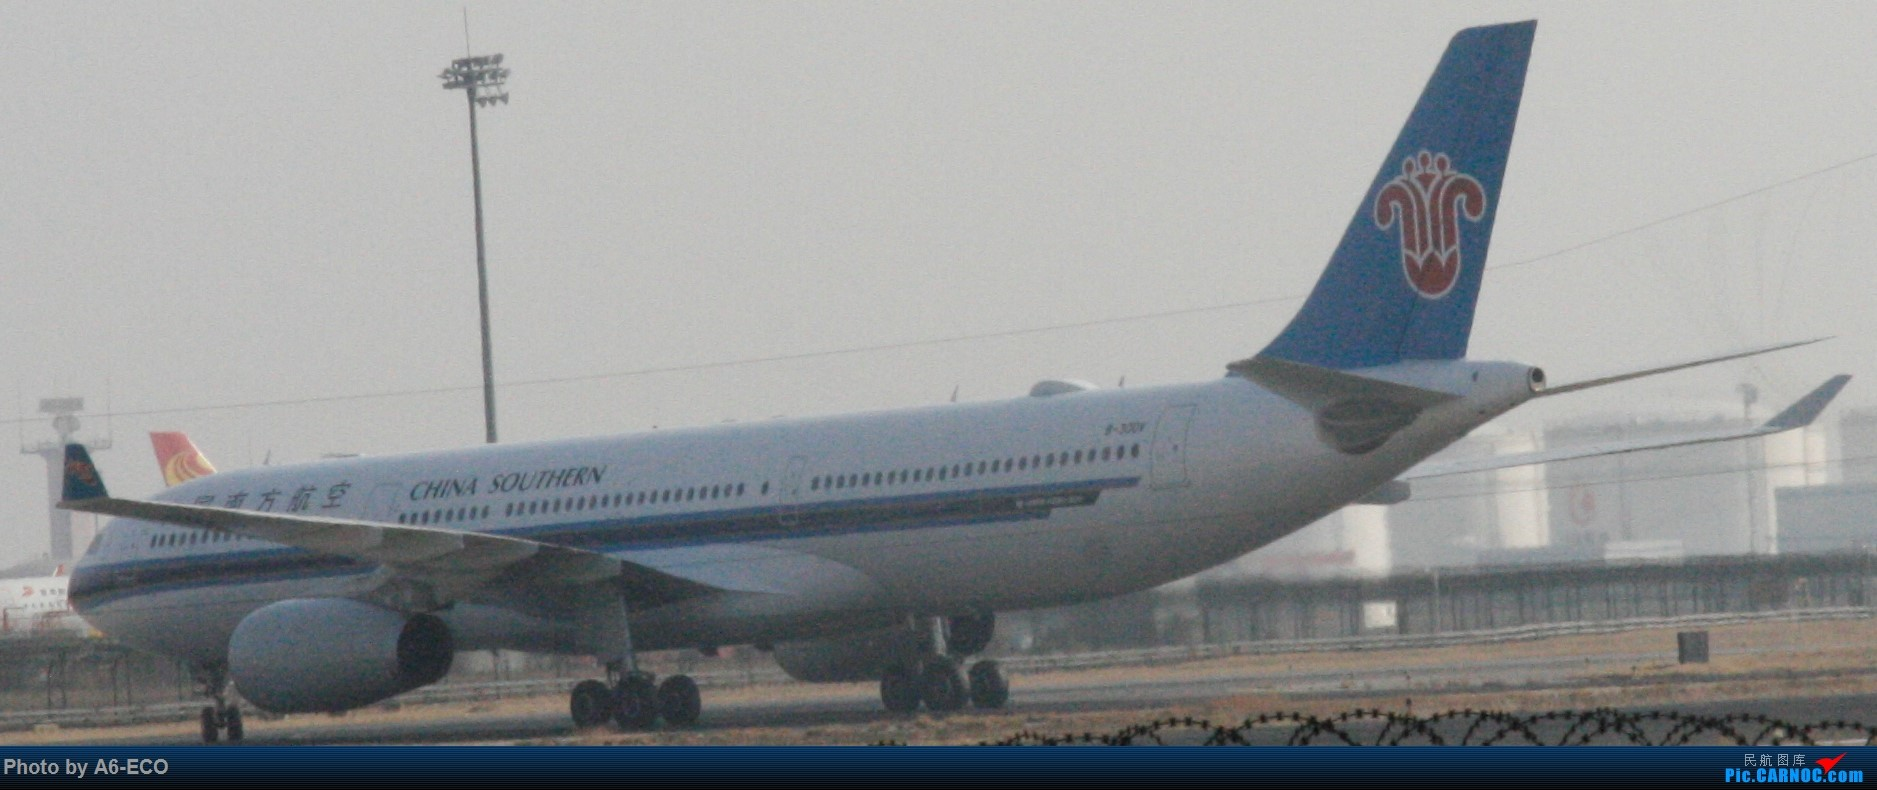 Re:[原创]今天运气极好,云南孔雀,B-1070,2个菜航邮戳,泡菜航彩绘,东航邮戳...... AIRBUS A330-300 B-300V 中国北京首都国际机场